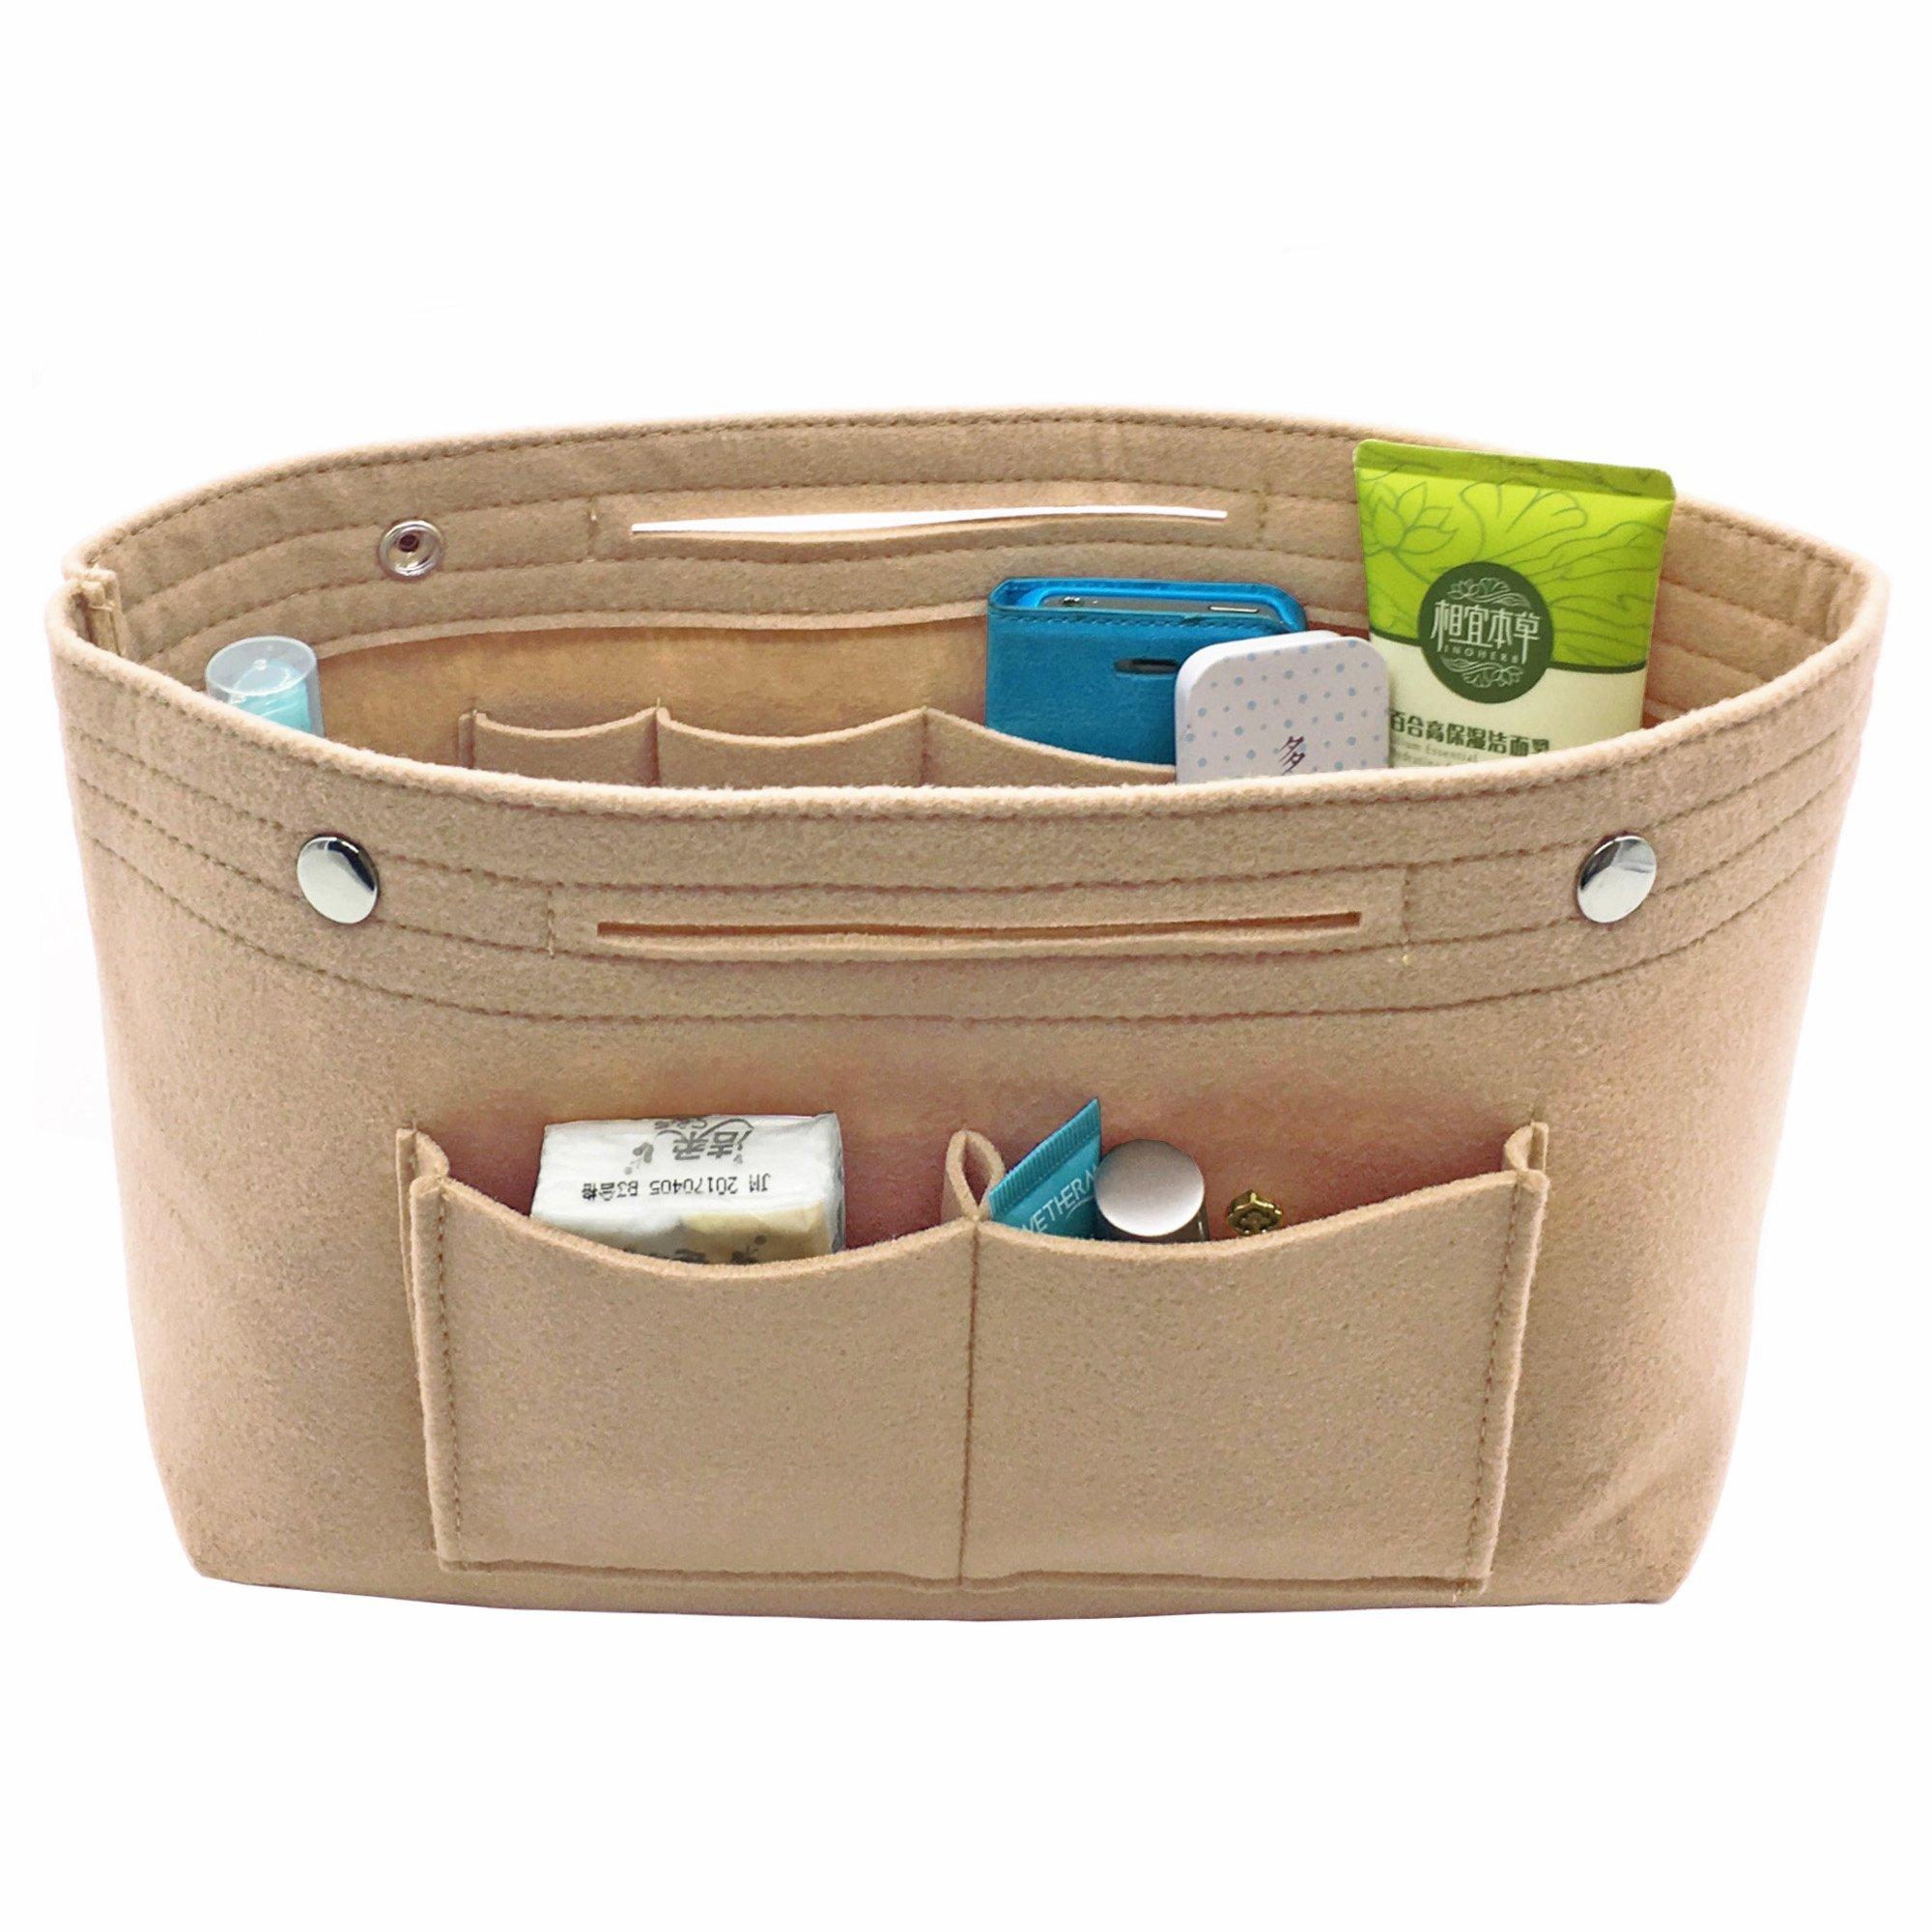 eeff9564a266 VANCORE Felt Insert Purse Organizer Handbag Cosmetic Travel Bag for Women  Nude Small